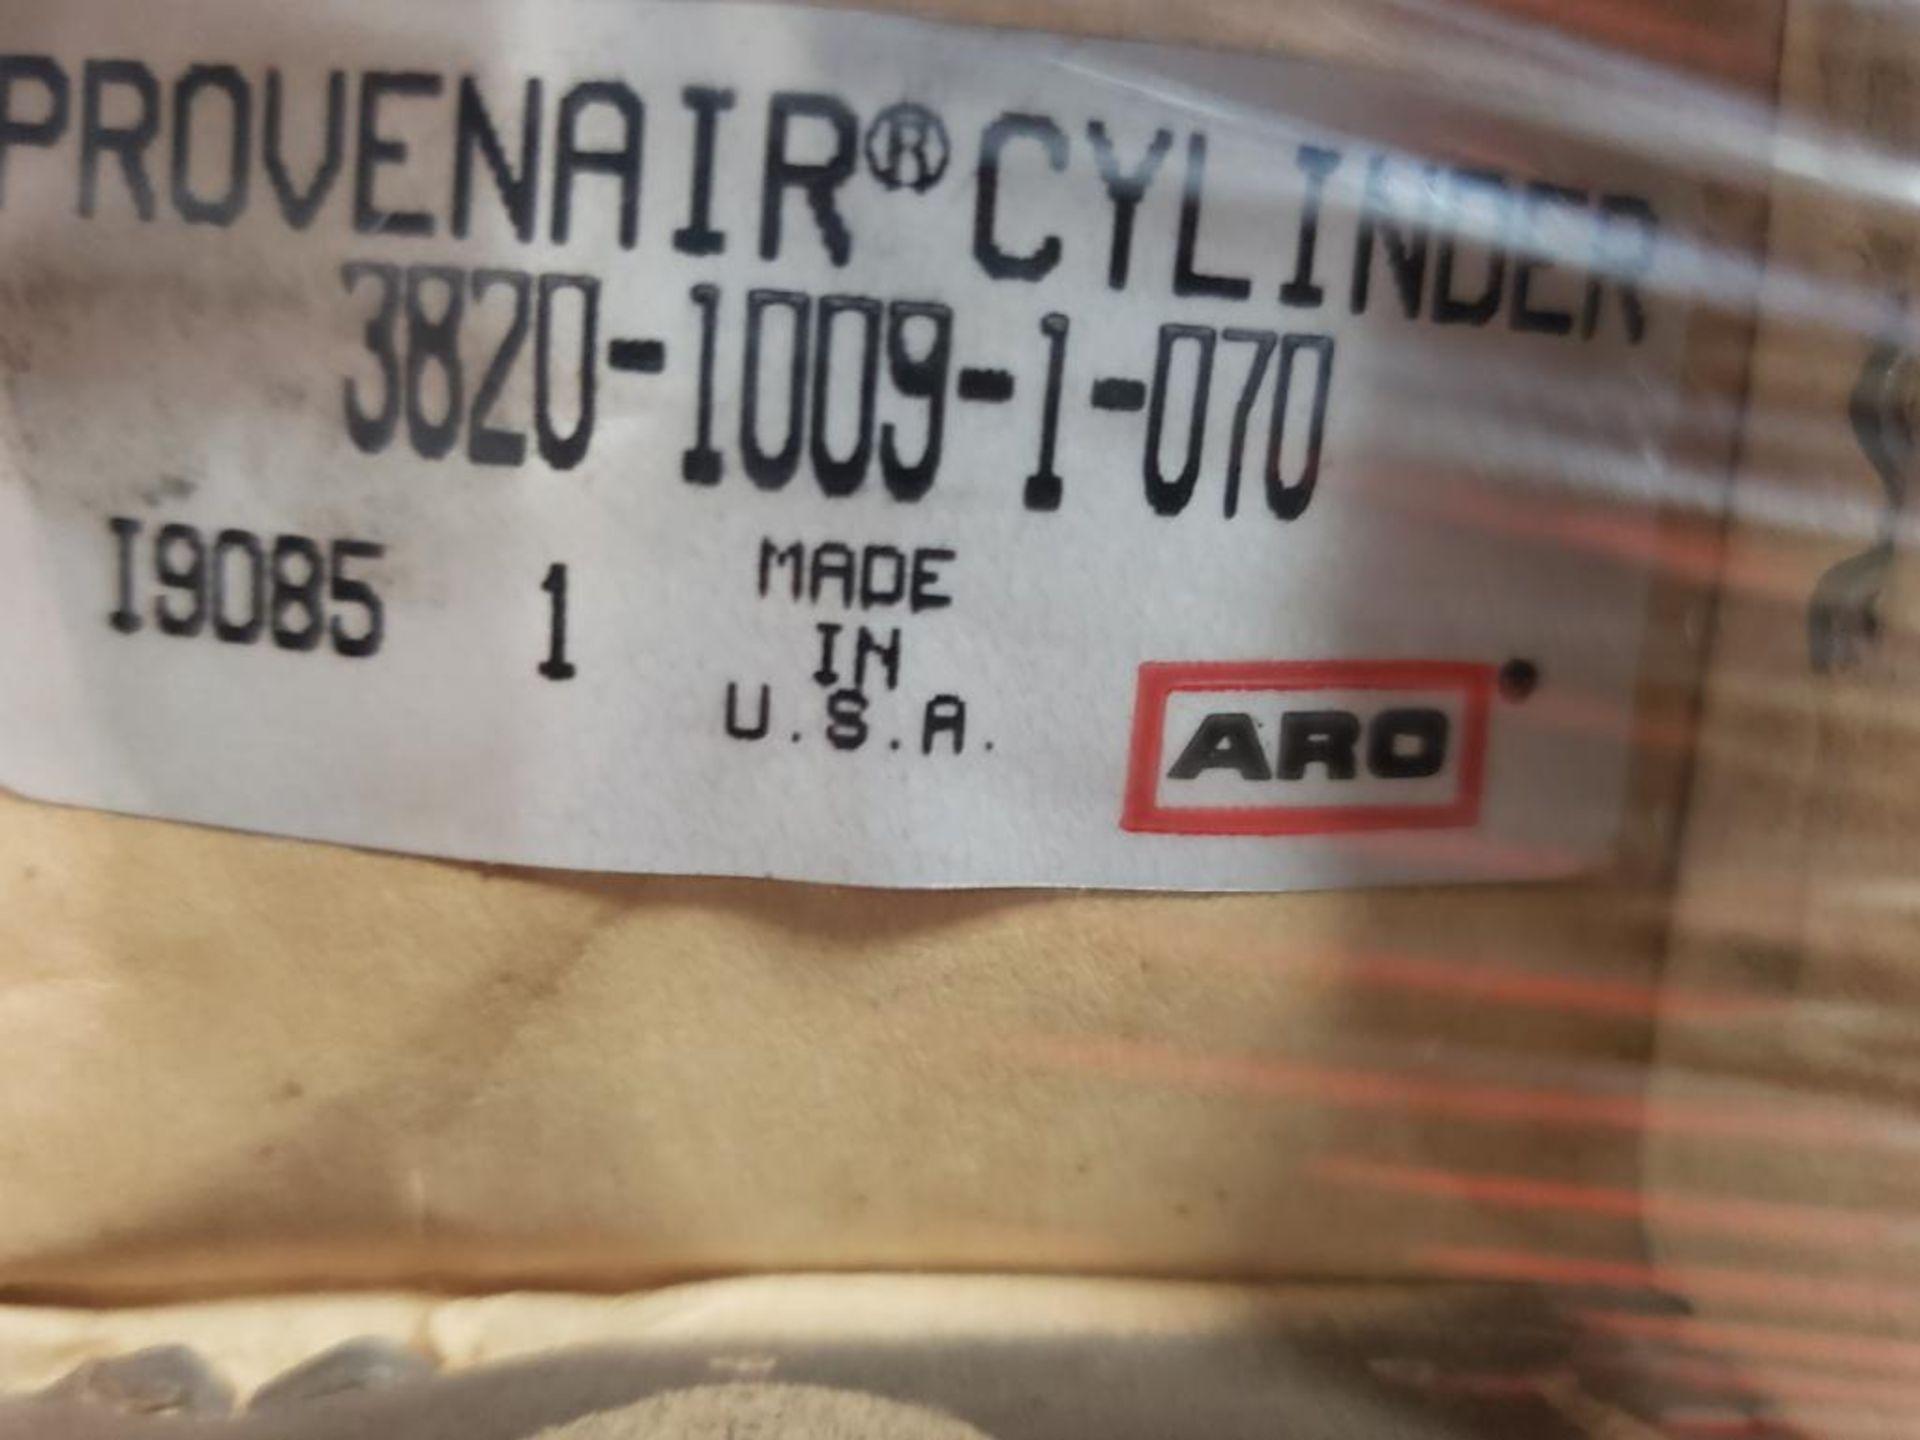 ARO 3820-1009-1-070 Provenair Cylinder.